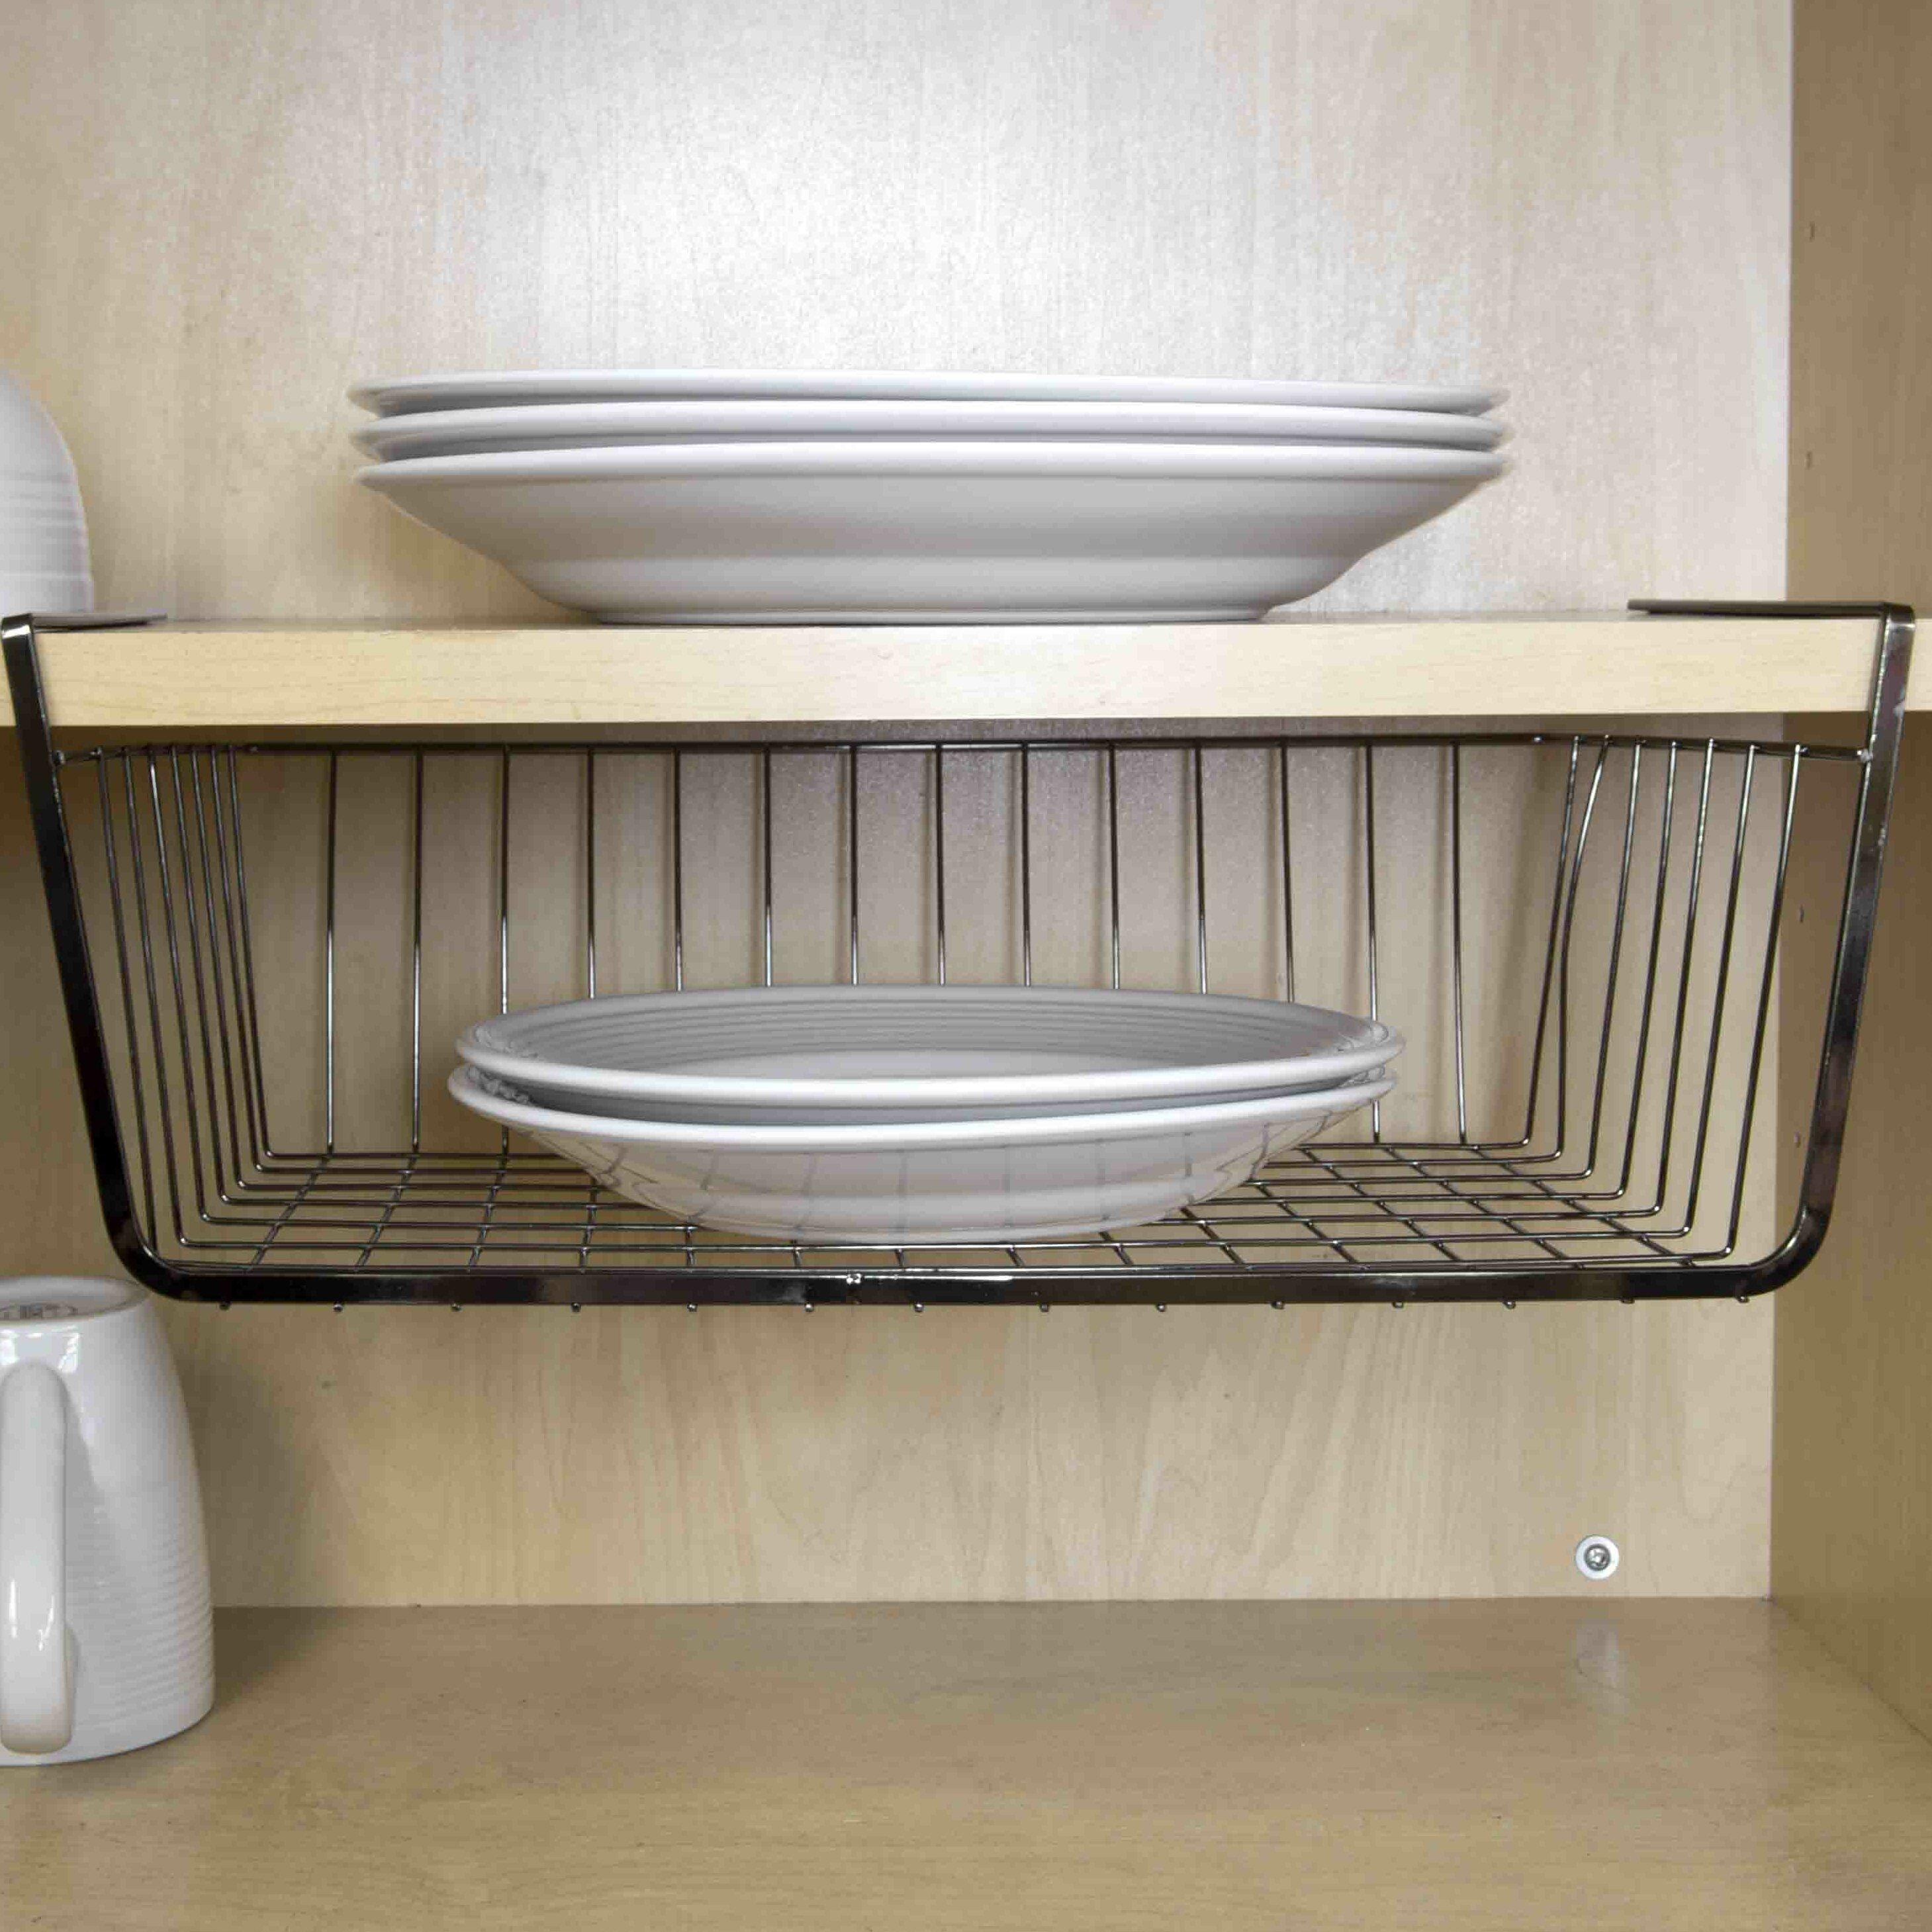 wayfair basics wayfair basics metal under shelf basket. Black Bedroom Furniture Sets. Home Design Ideas